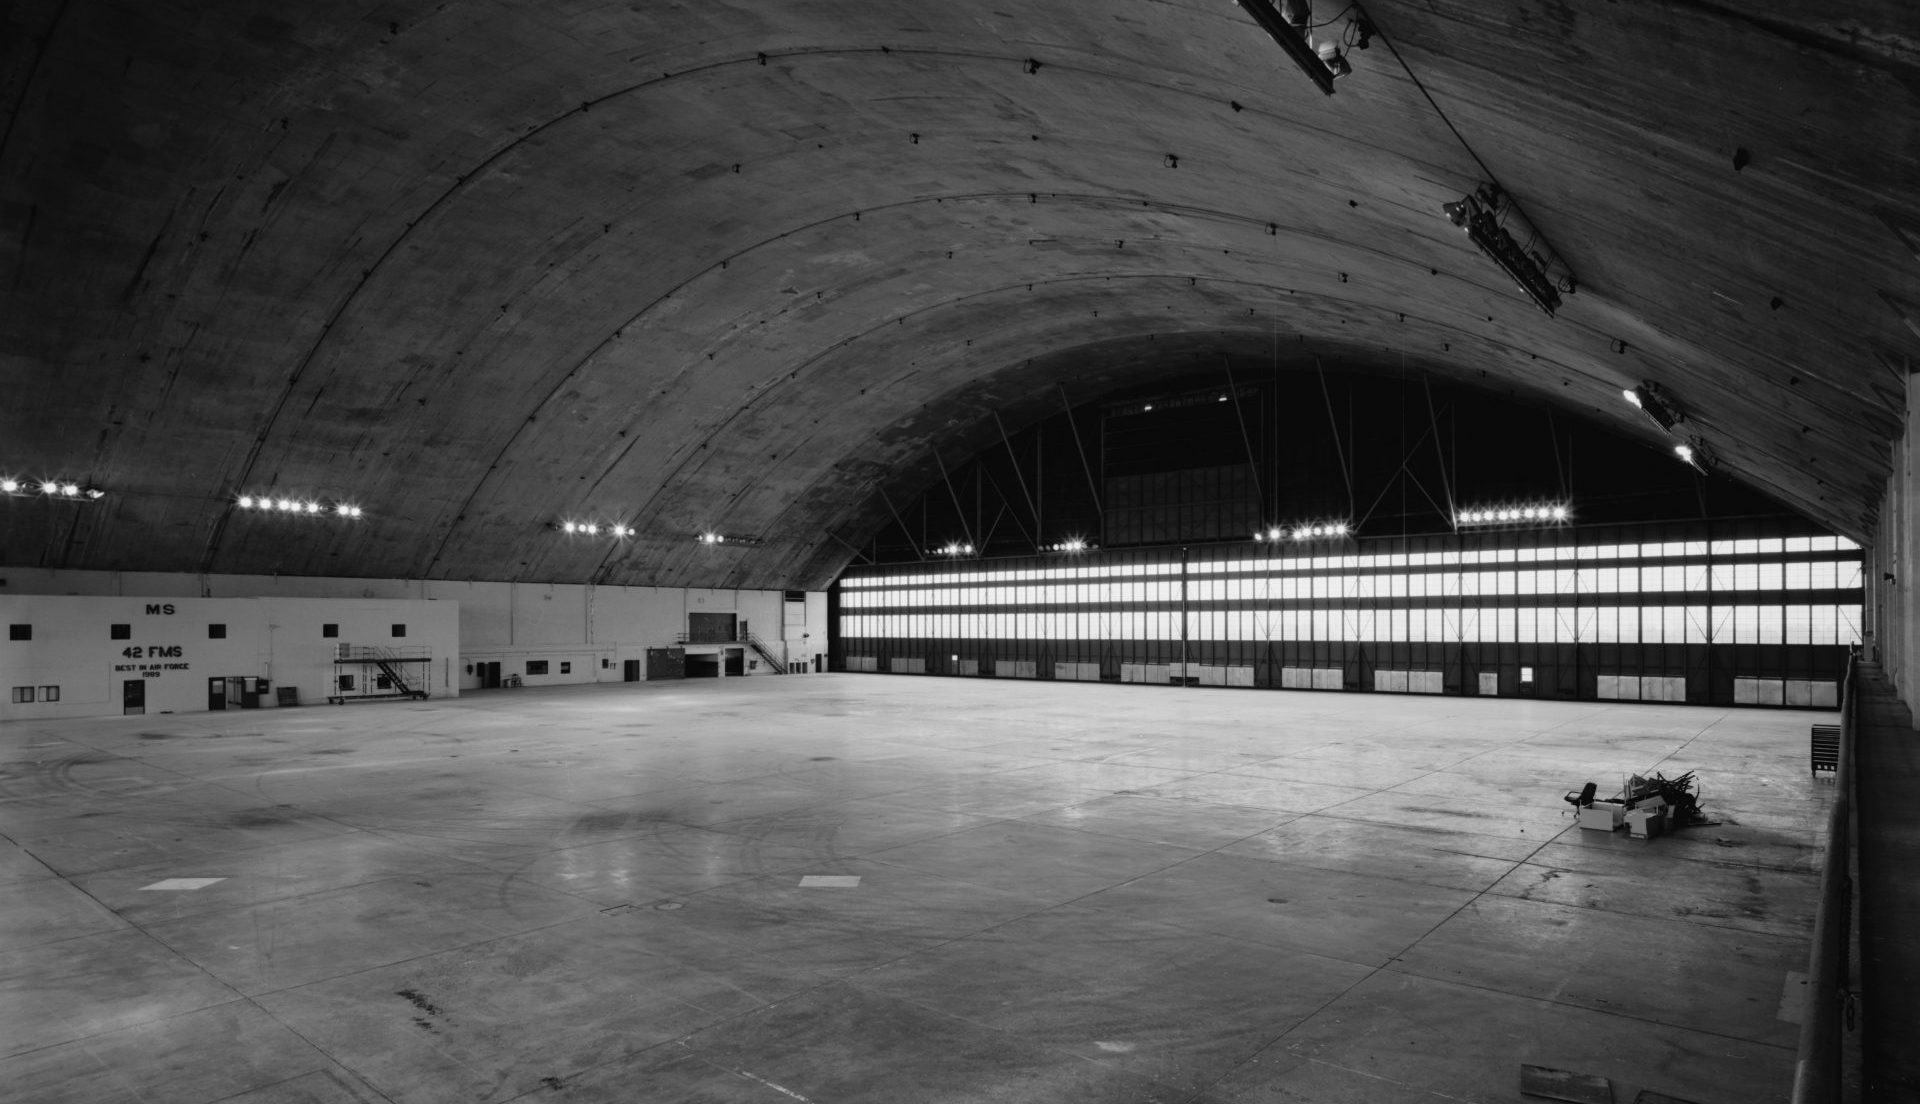 The DET hangar, black and white image of cavernous interior of large aircraft hangar.